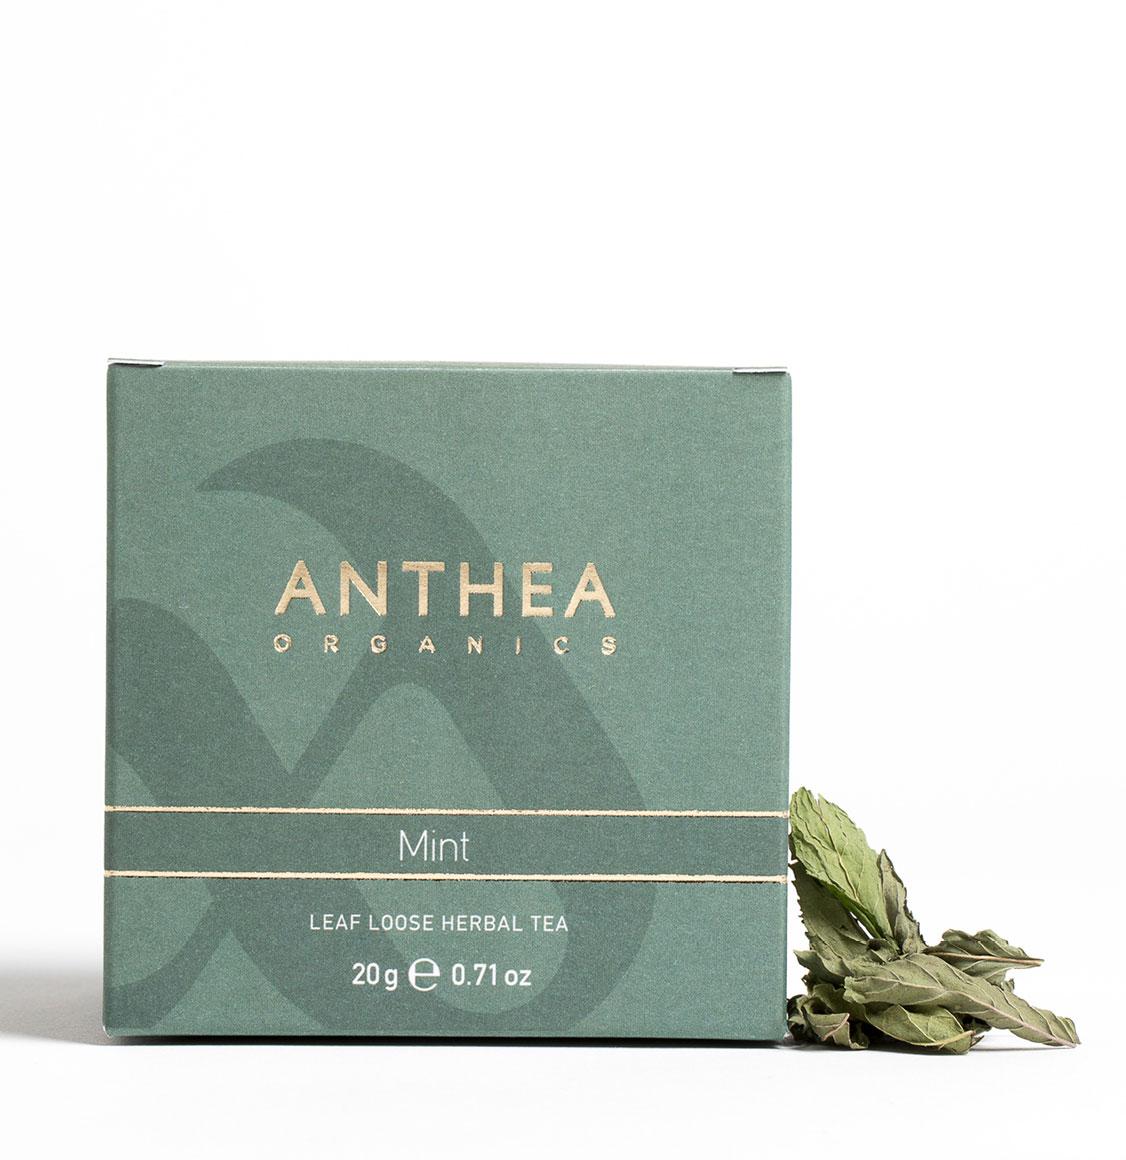 Anthea Organics Βιολογική Μέντα Leaf Loose Mint 20g